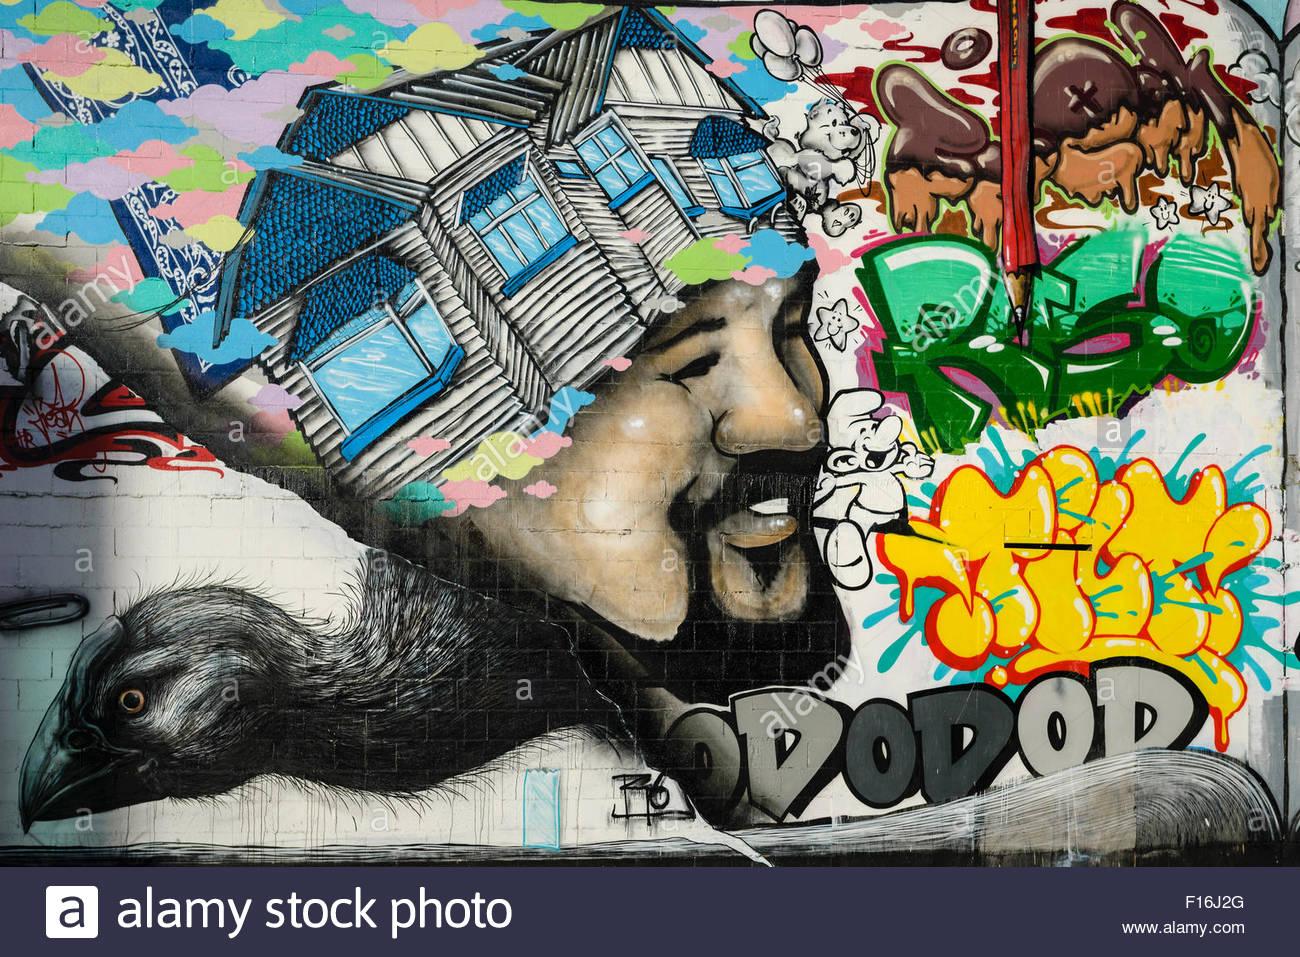 Graffiti wall christchurch - Mural On Wall In Devastated Downtown Christchurch